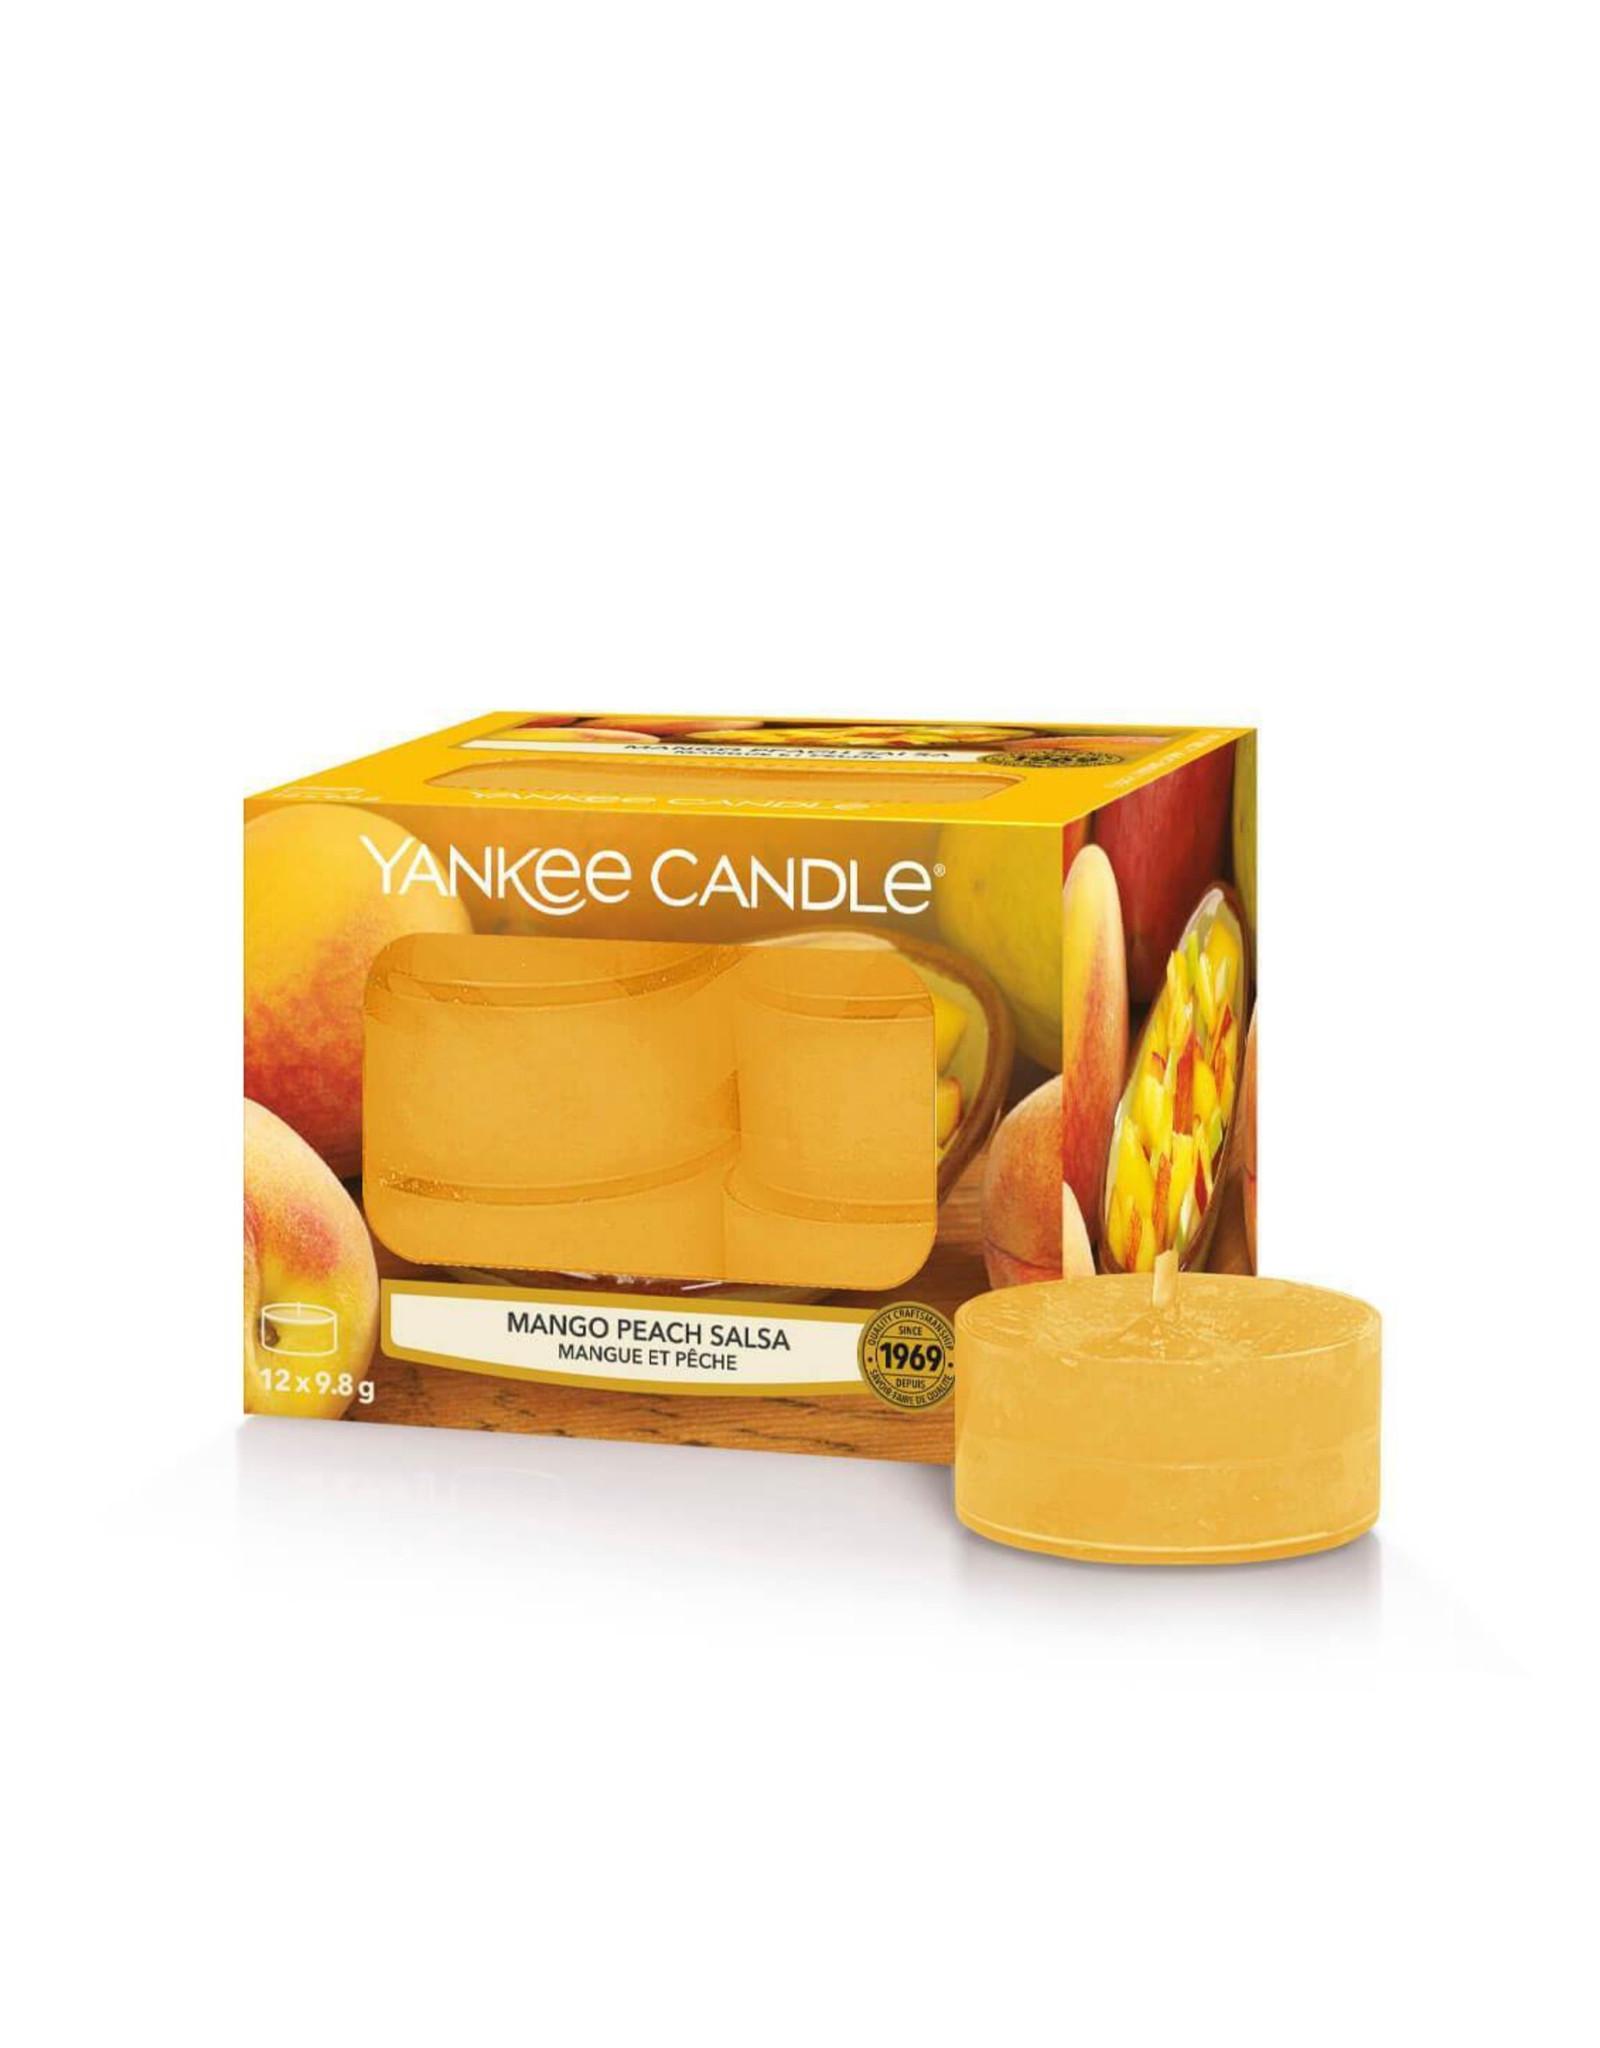 Yankee Candle Mango Peach Salsa - Tea Lights